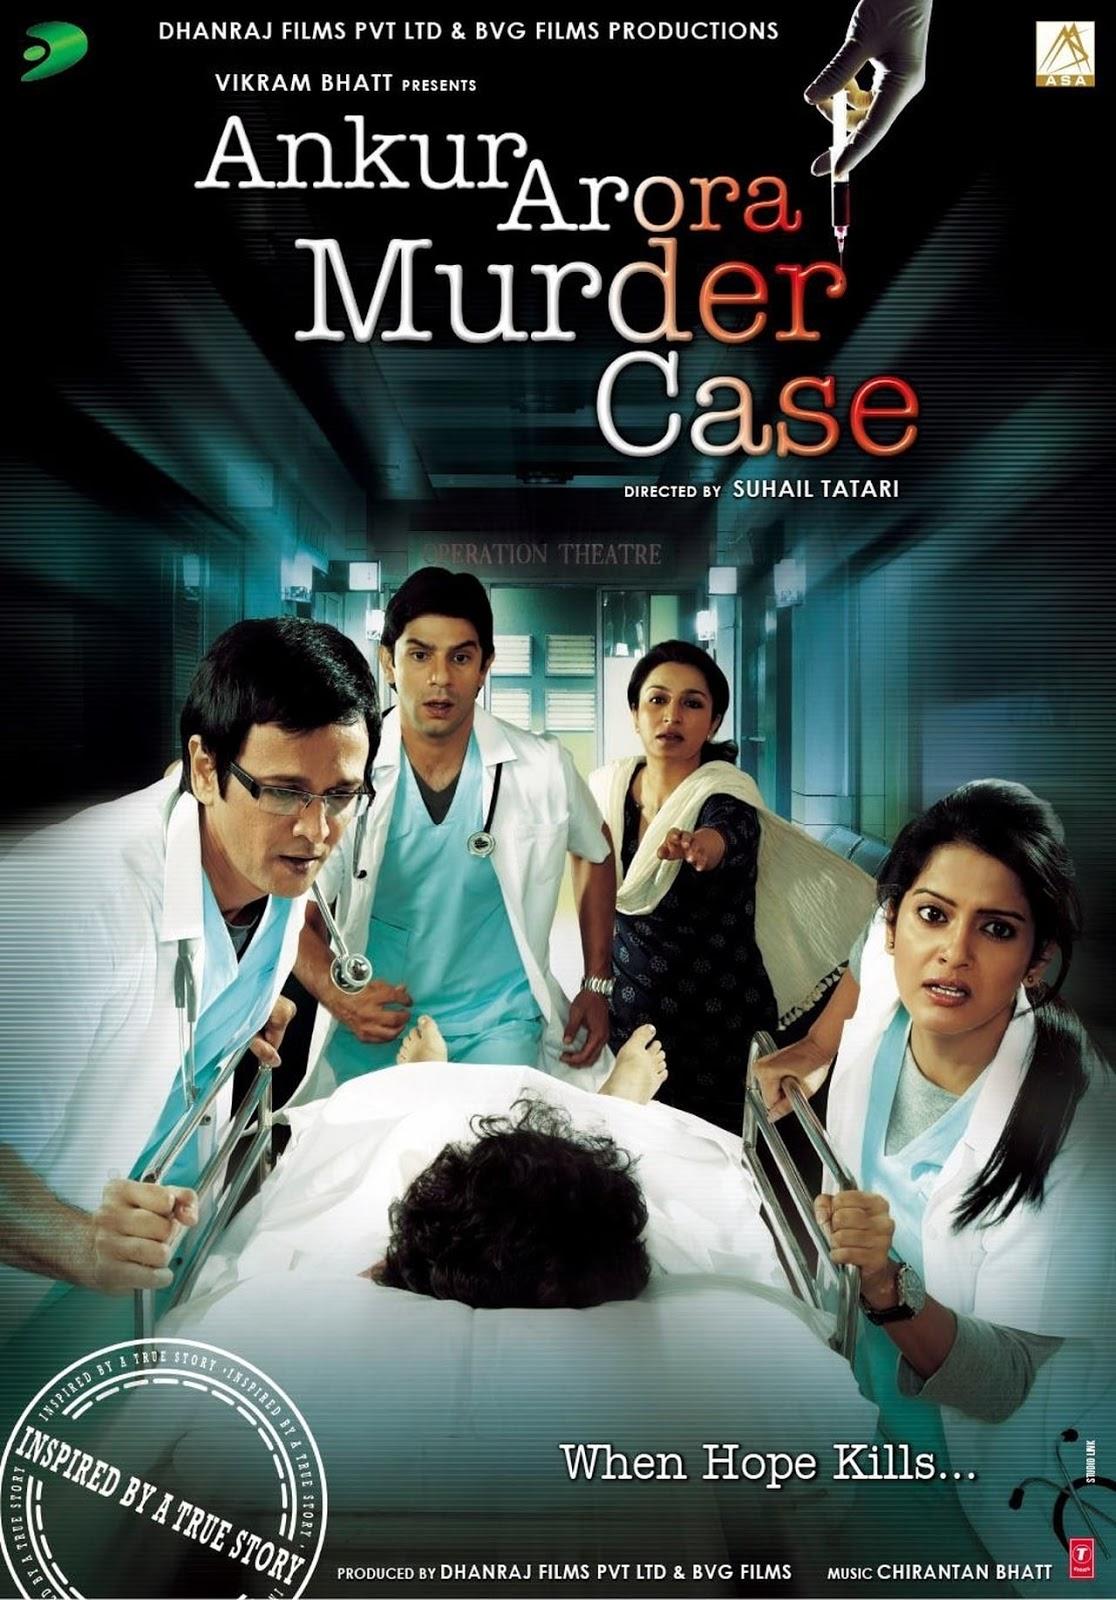 Ankur Arora Murder Case 2013 Hindi 720p HDRip Full Movie Free Download